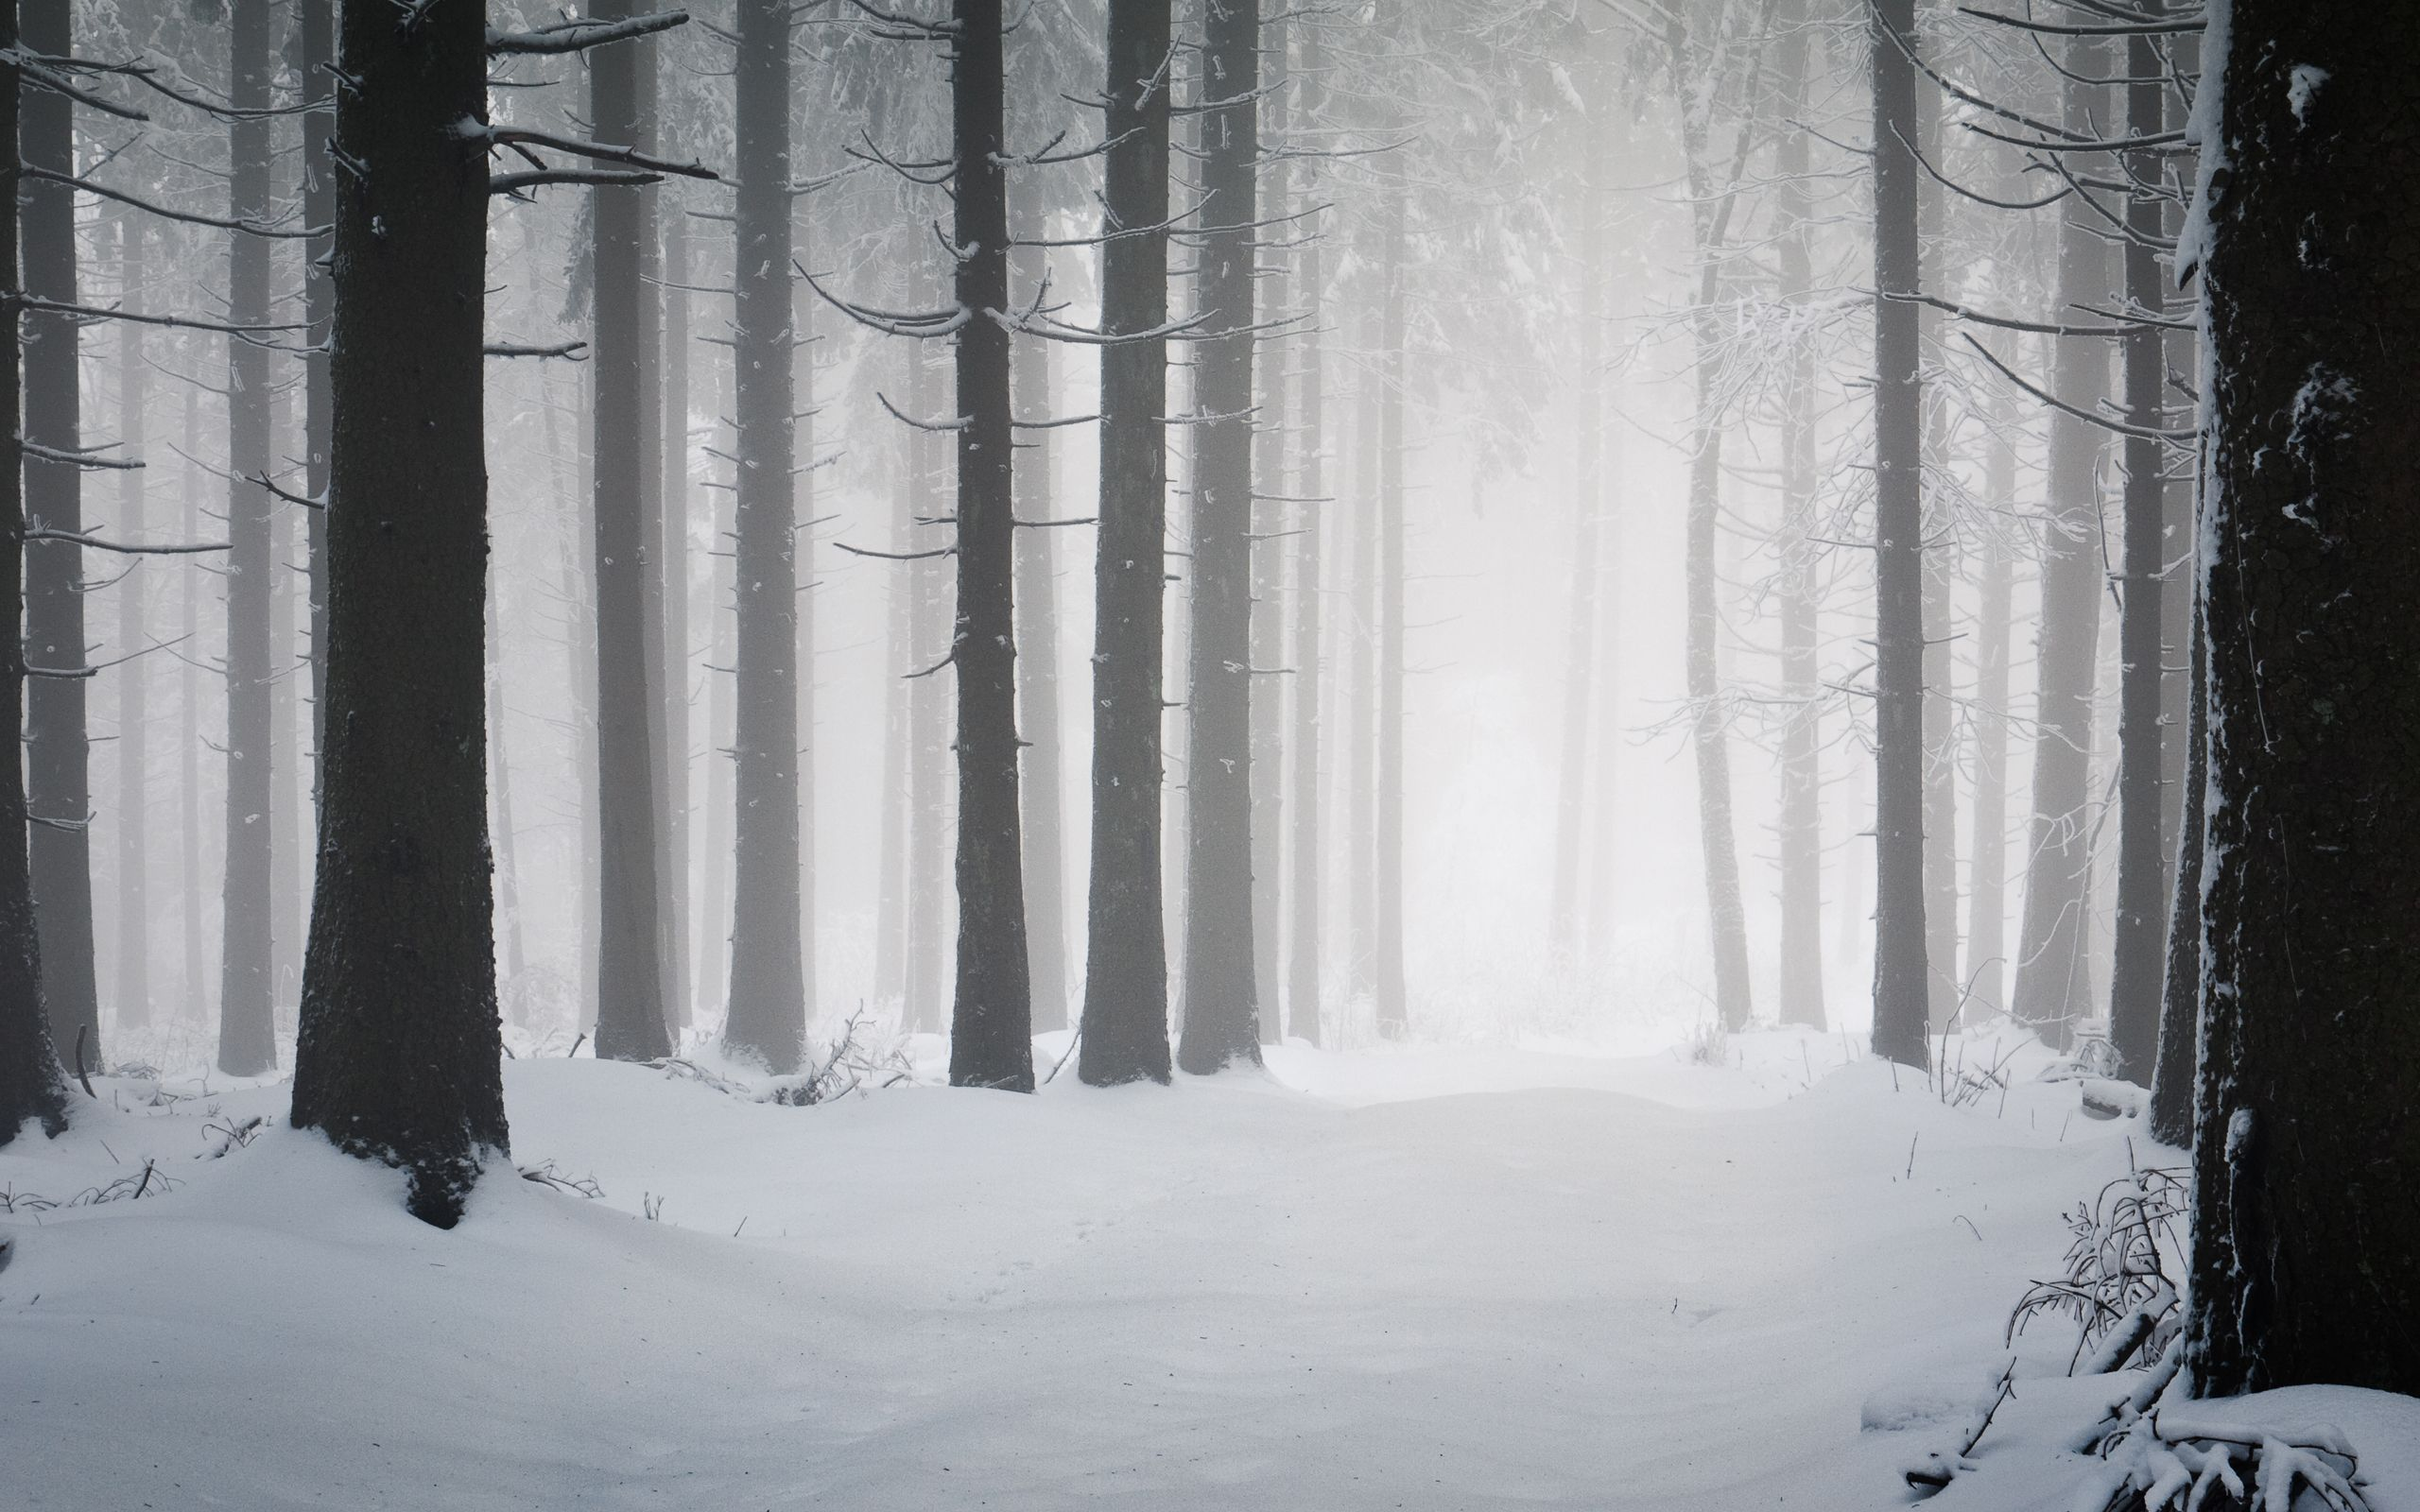 Hd wallpaper dark night - Snow Forest Google Search Torchbug Level Design